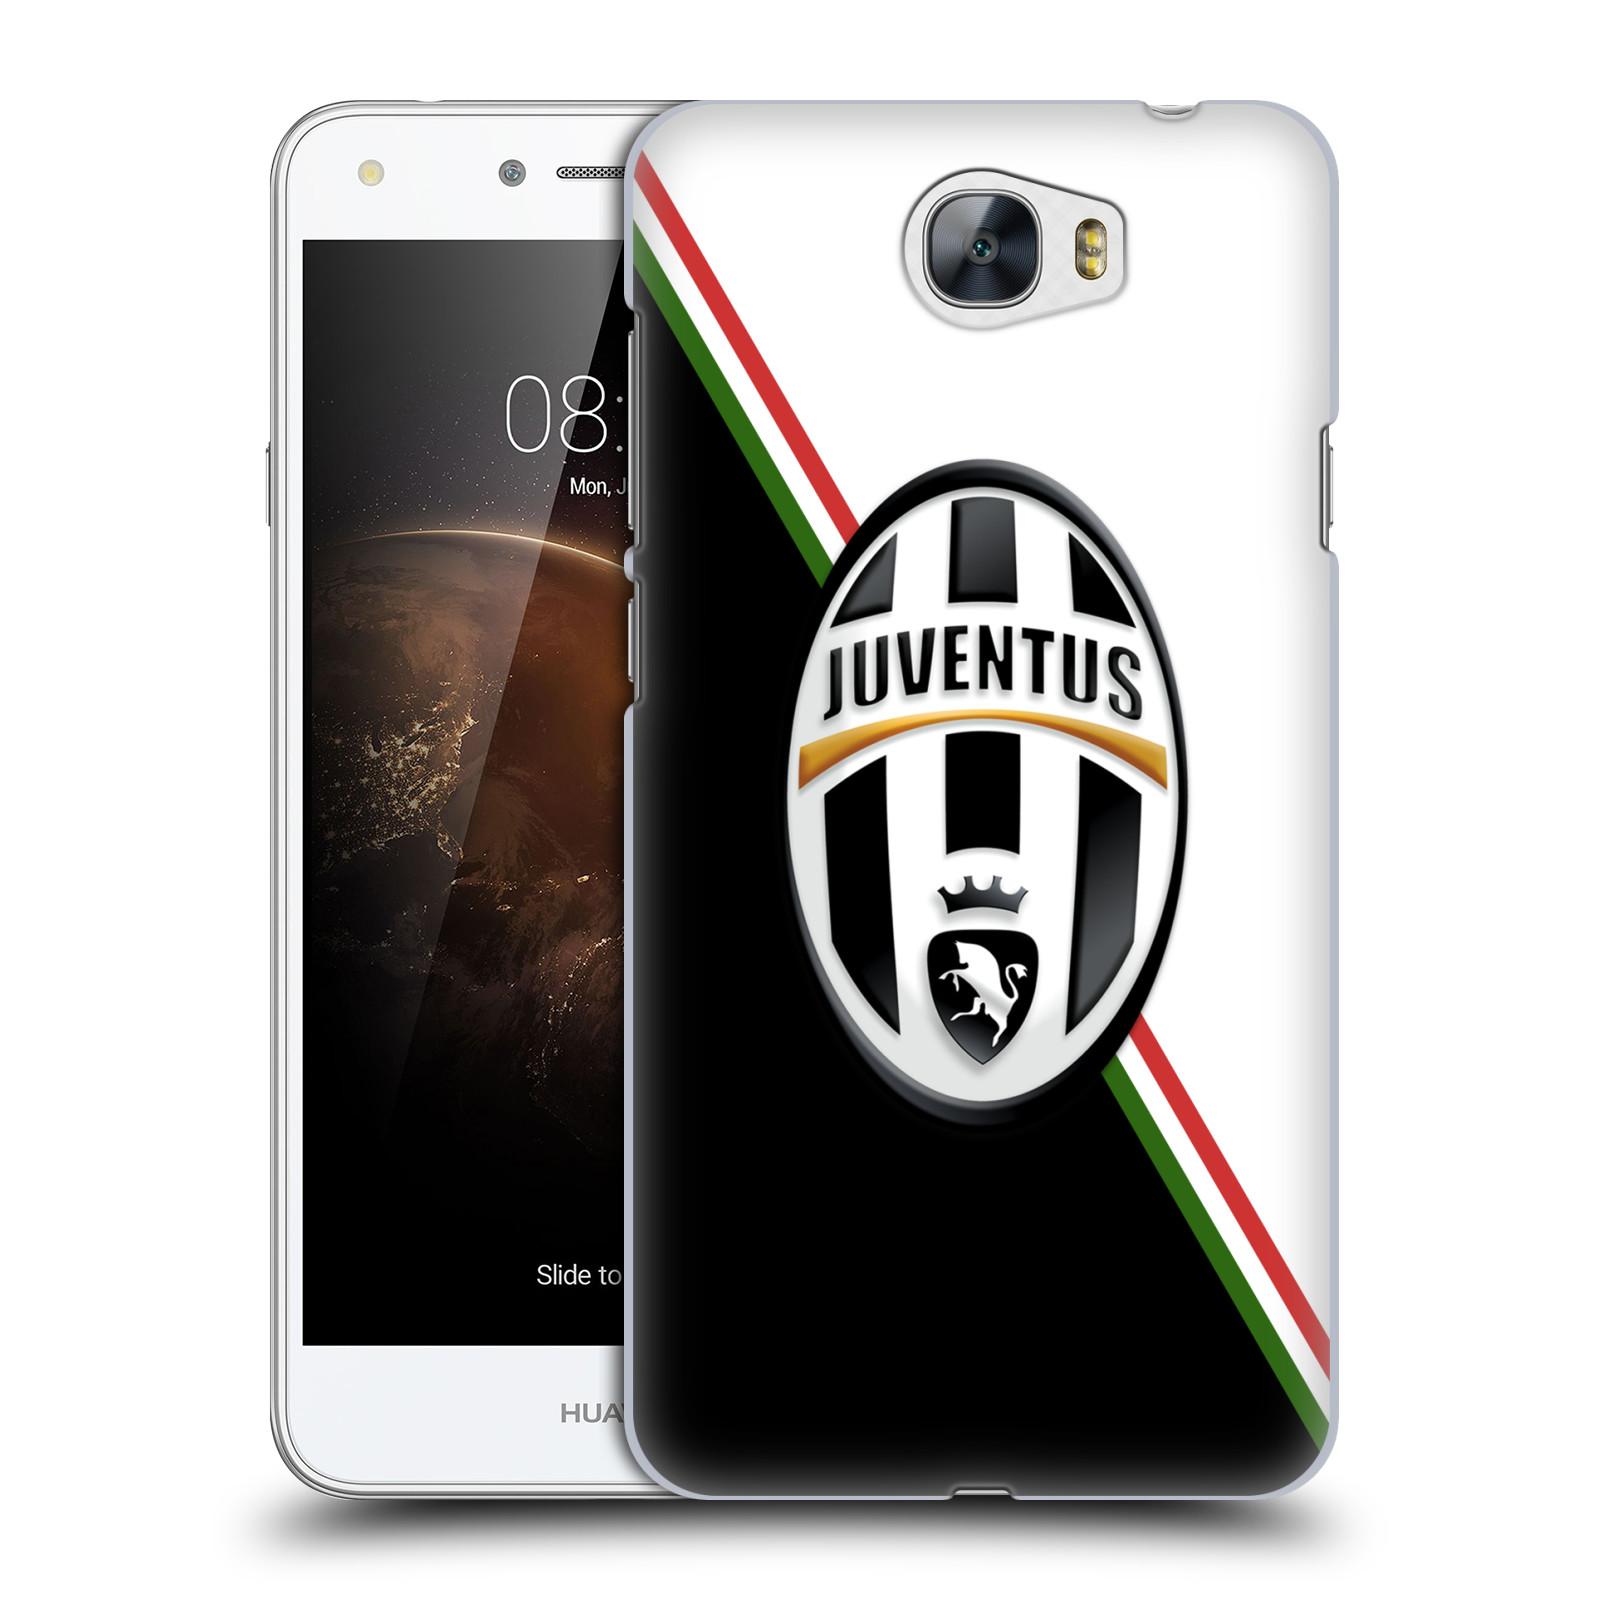 Plastové pouzdro na mobil Huawei Y5 II HEAD CASE Juventus FC - Black and White